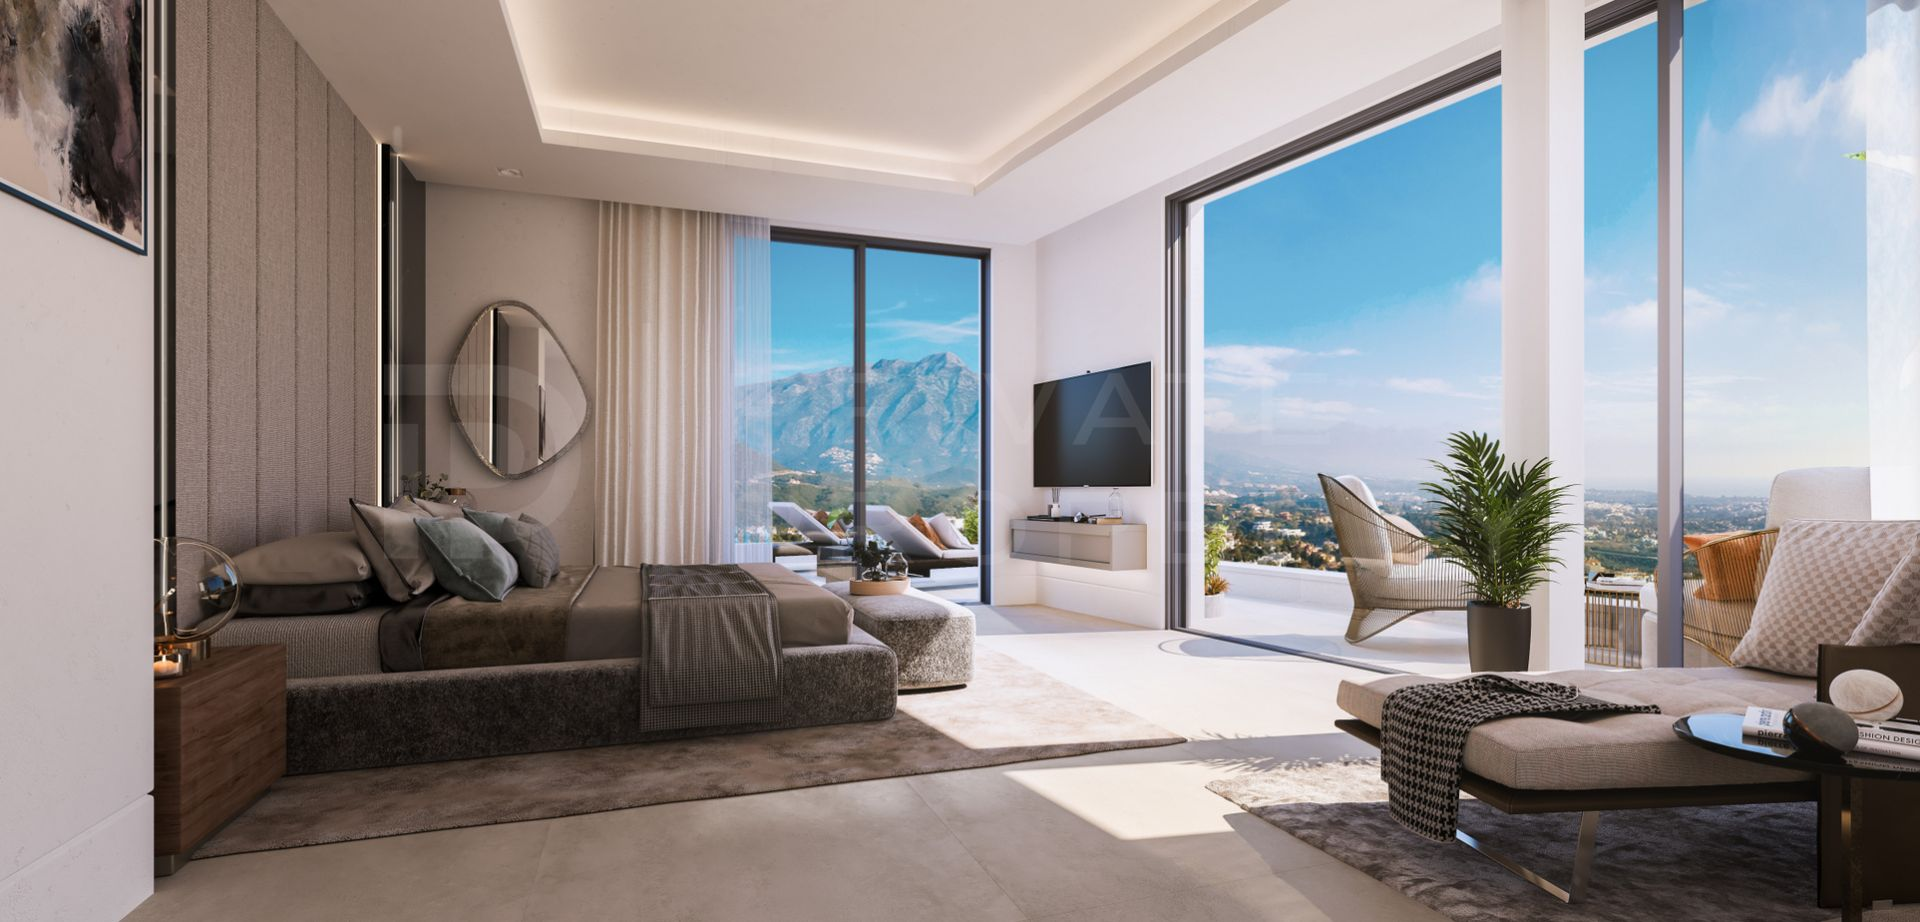 Exceptional apartments in La Quinta